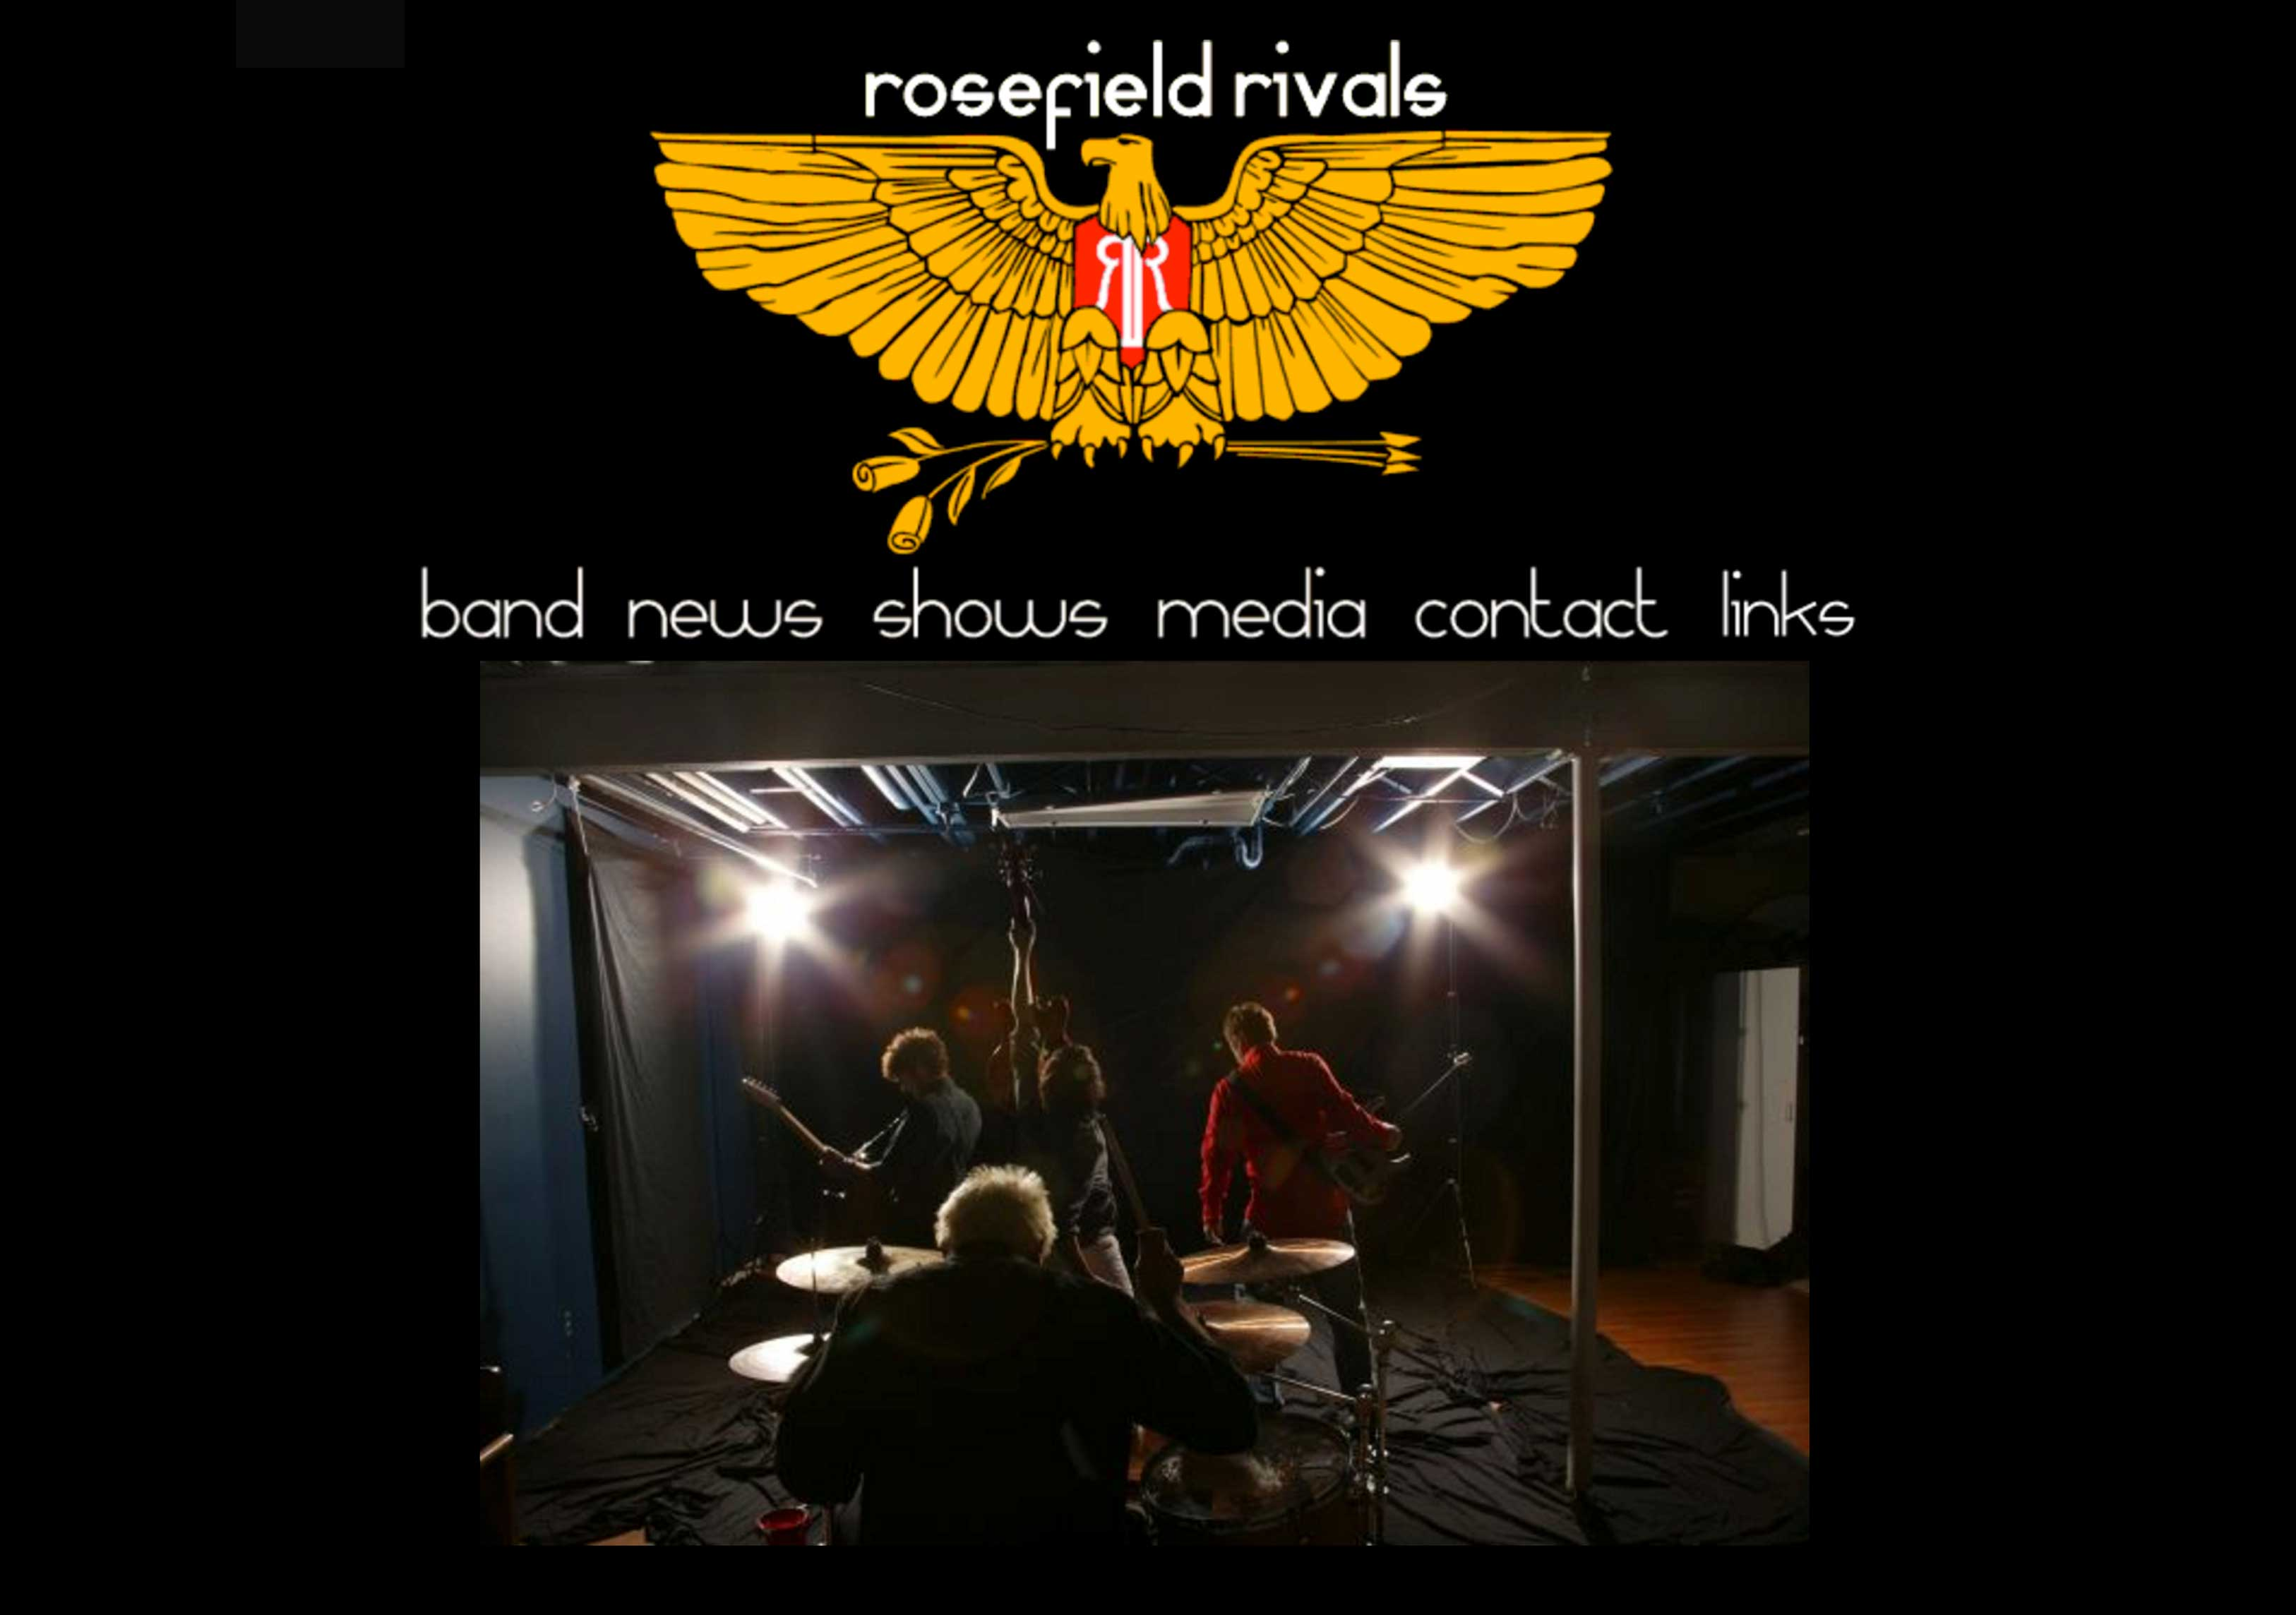 Rosefield Rivals